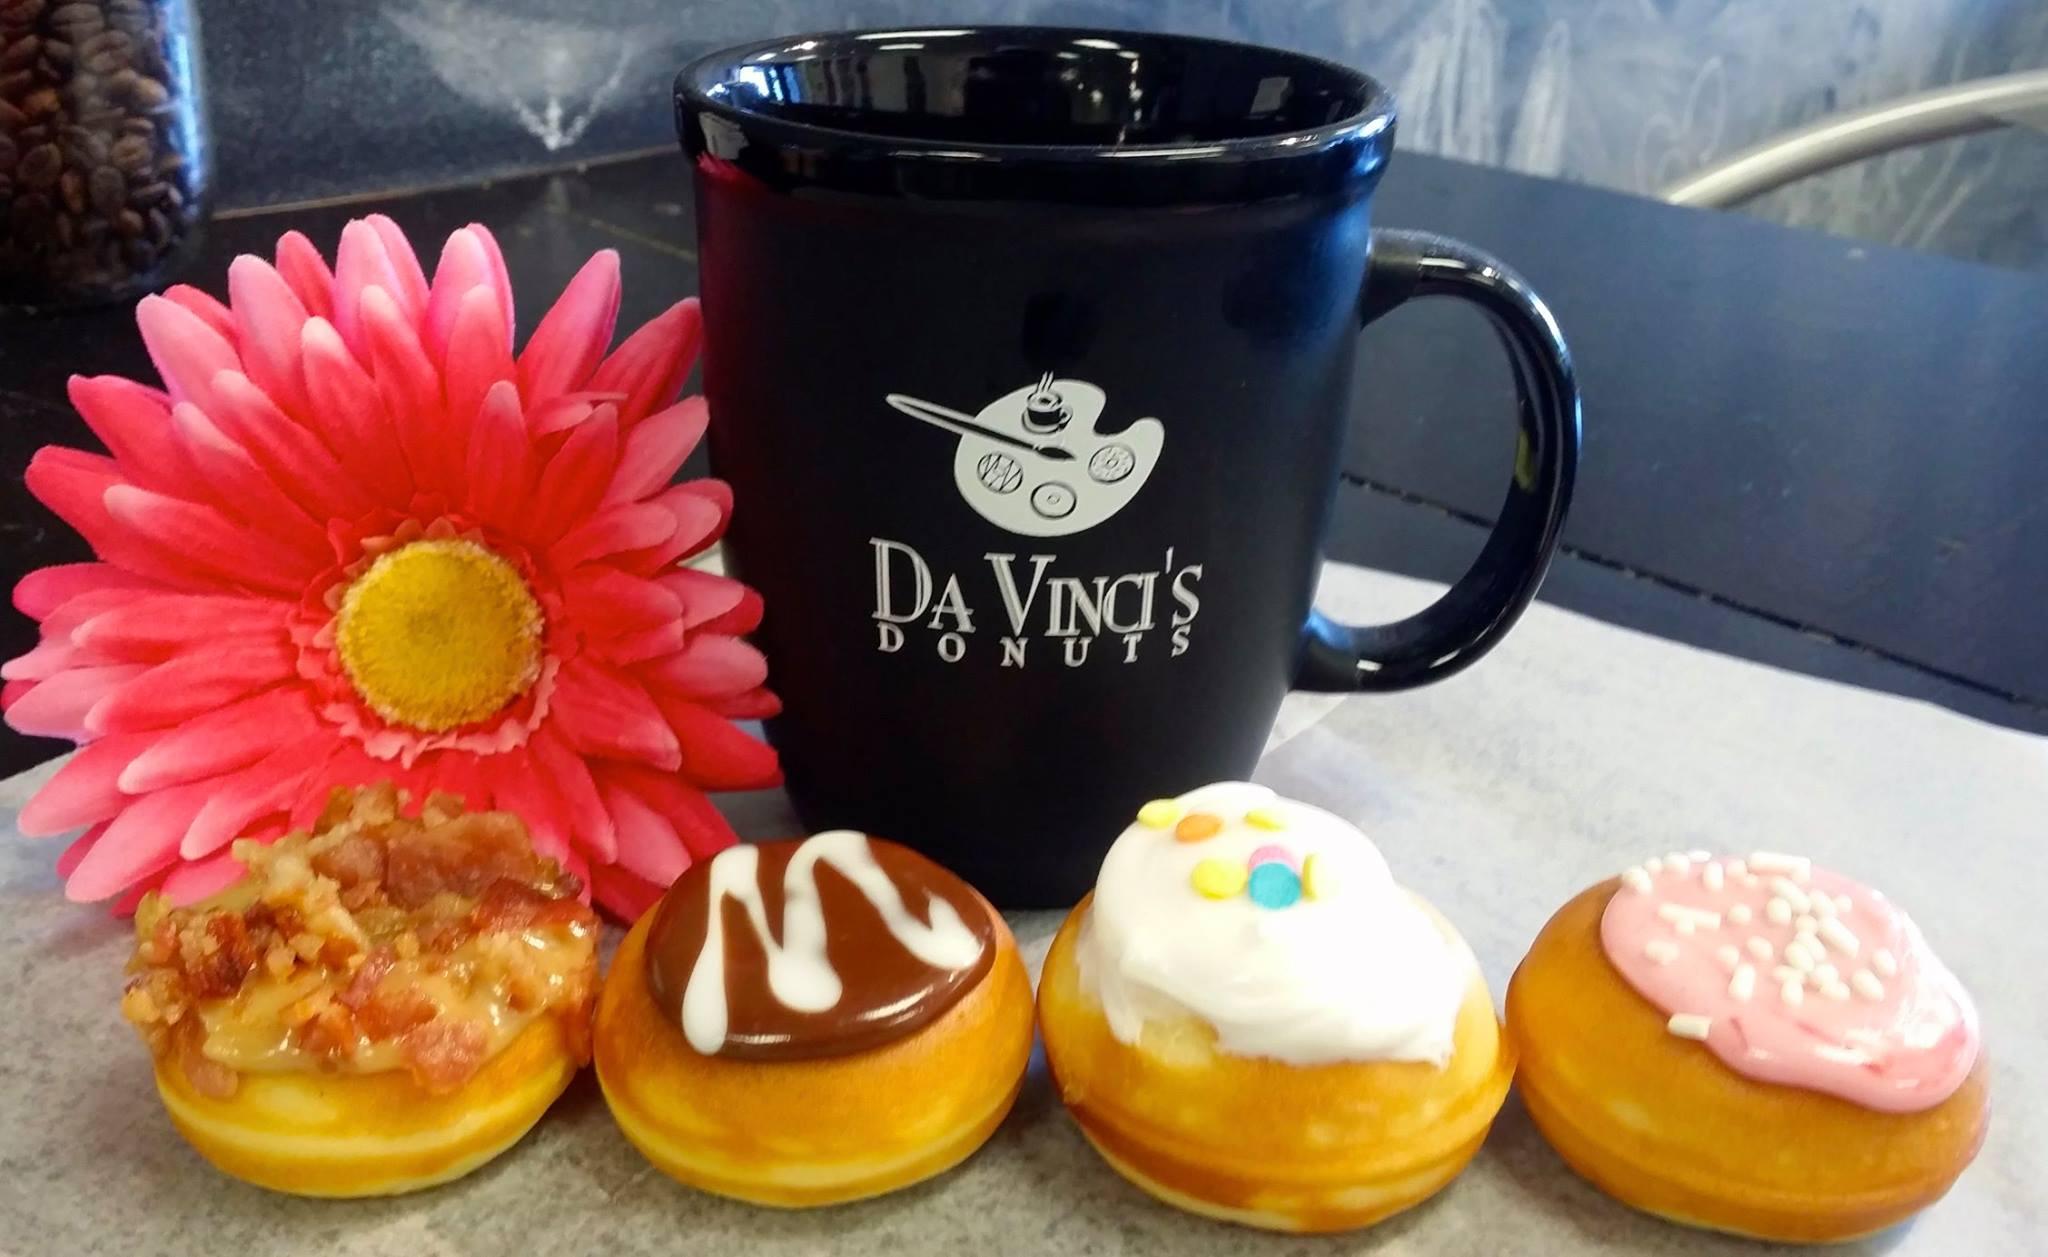 dunwoody to get da vinci s donuts what now atlanta